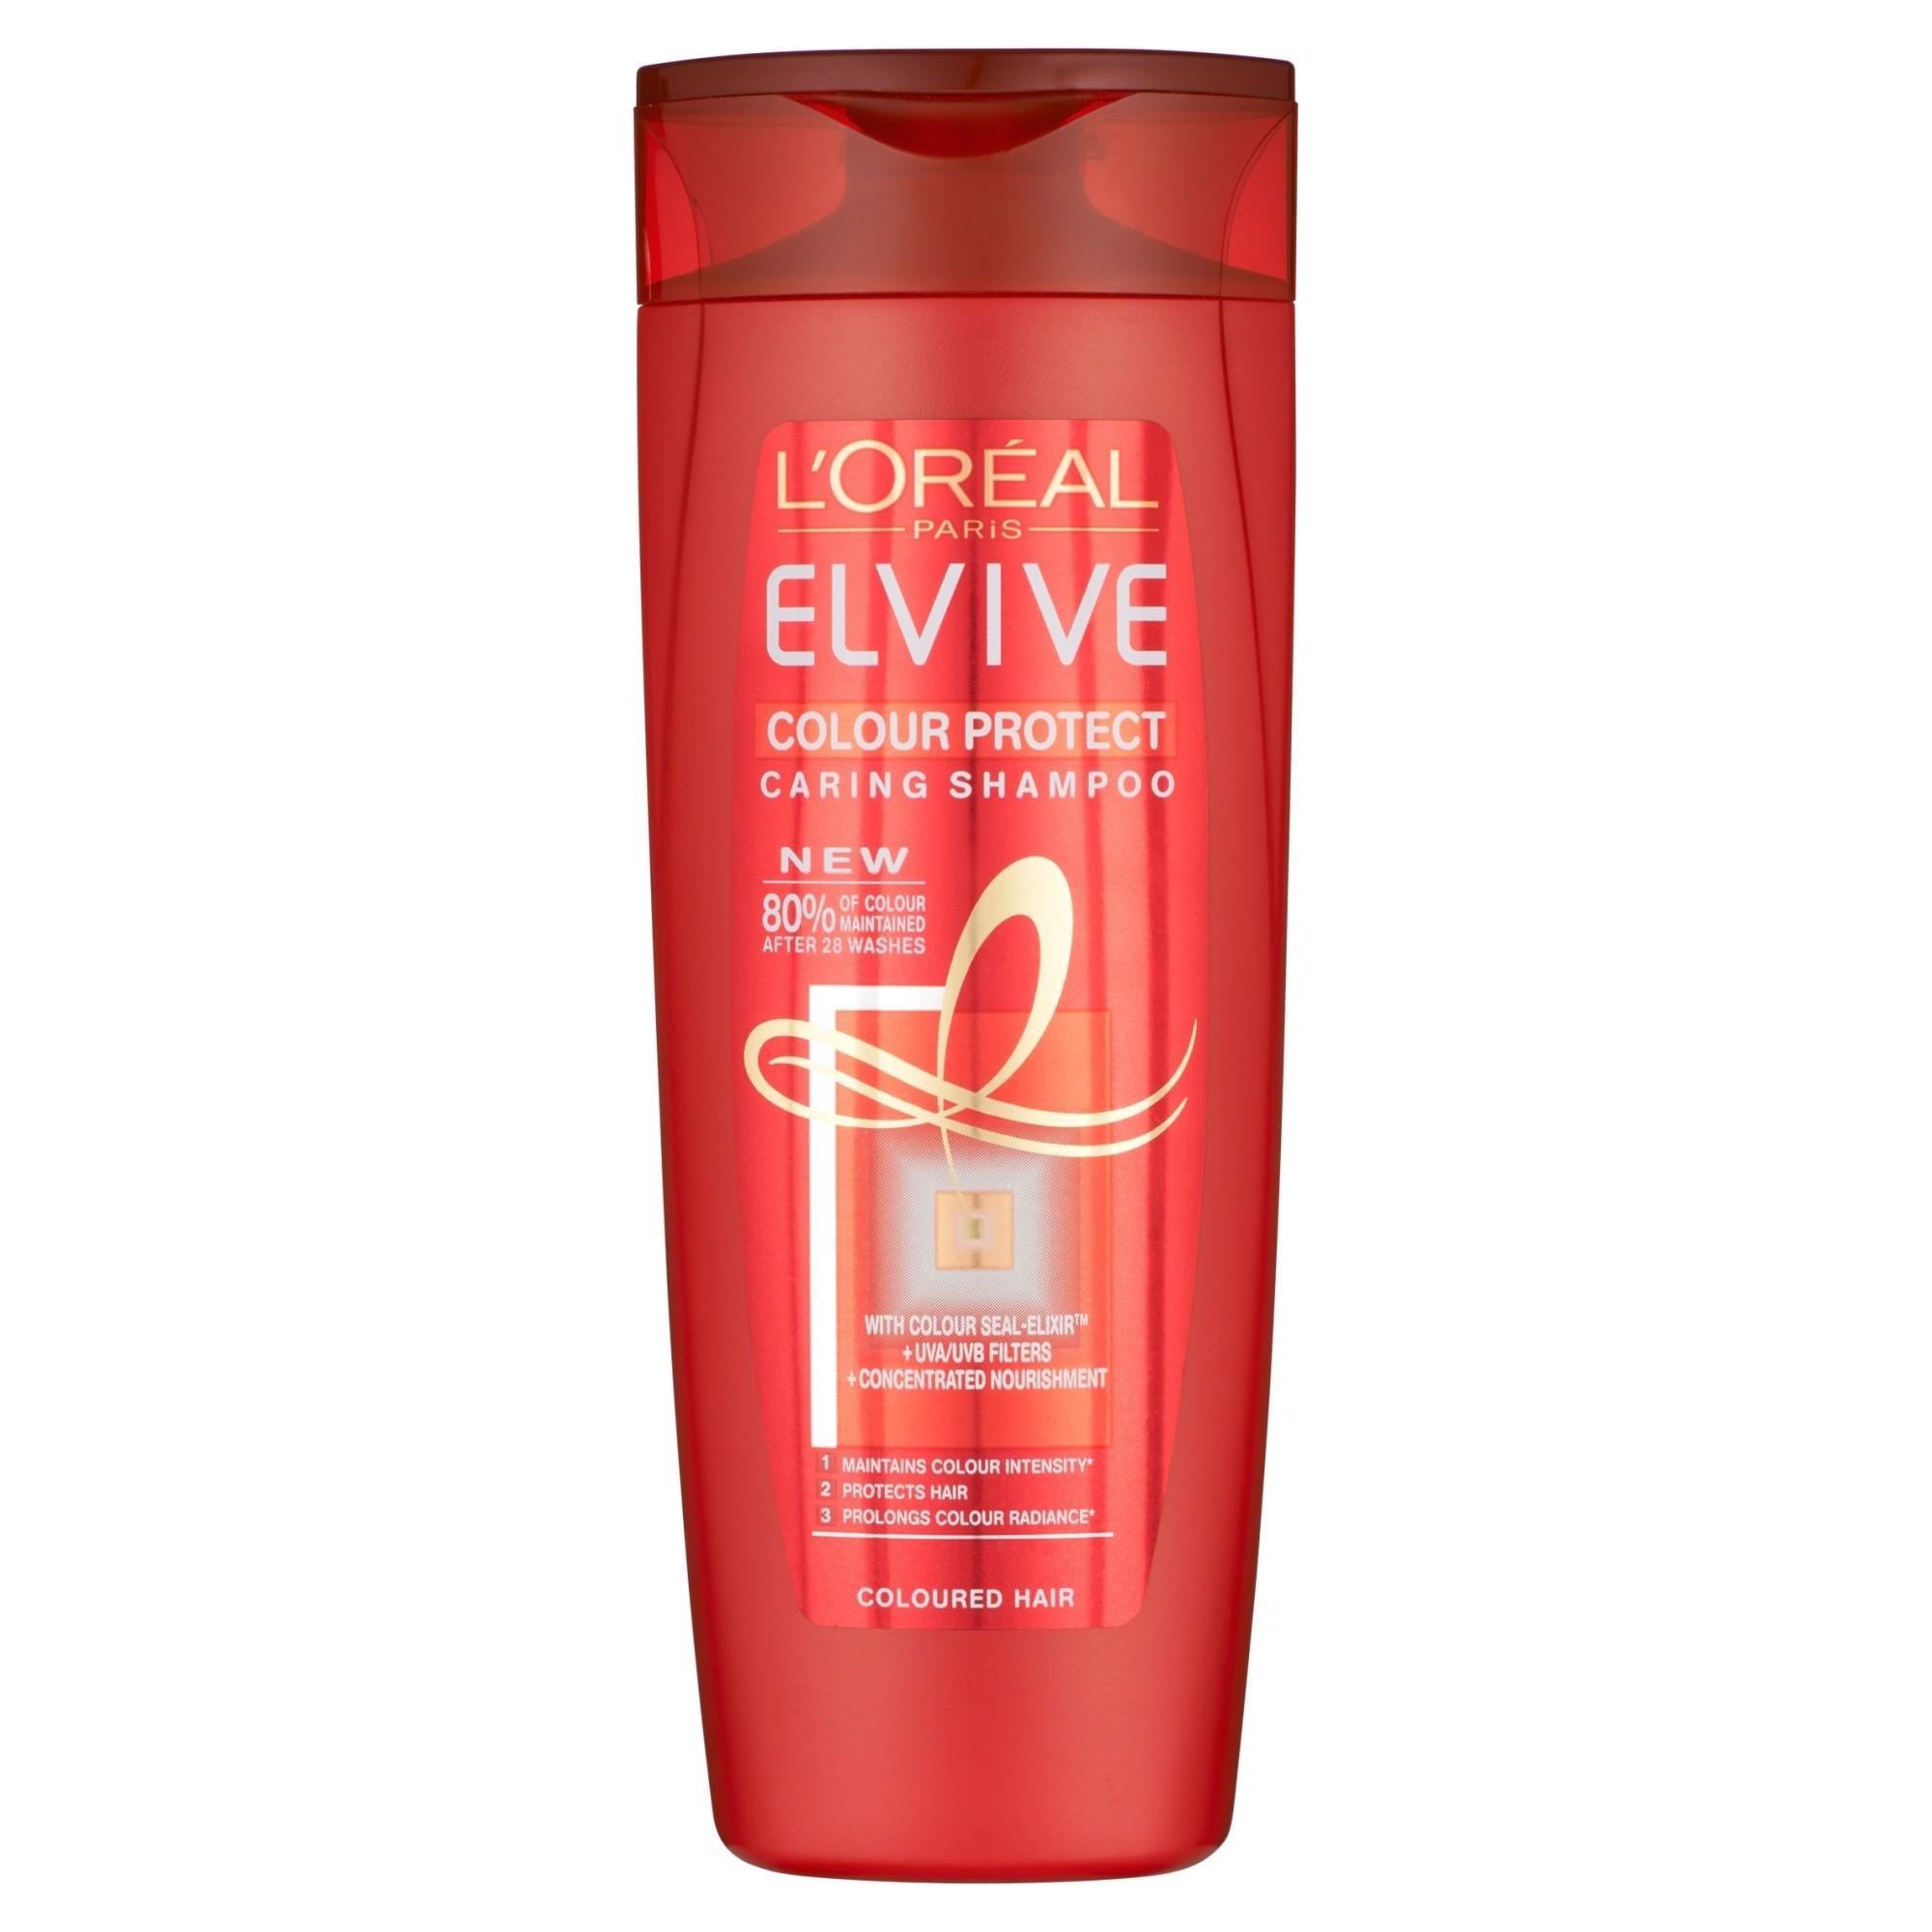 L'Oreal Paris Elvive Colour Protect Caring Shampoo